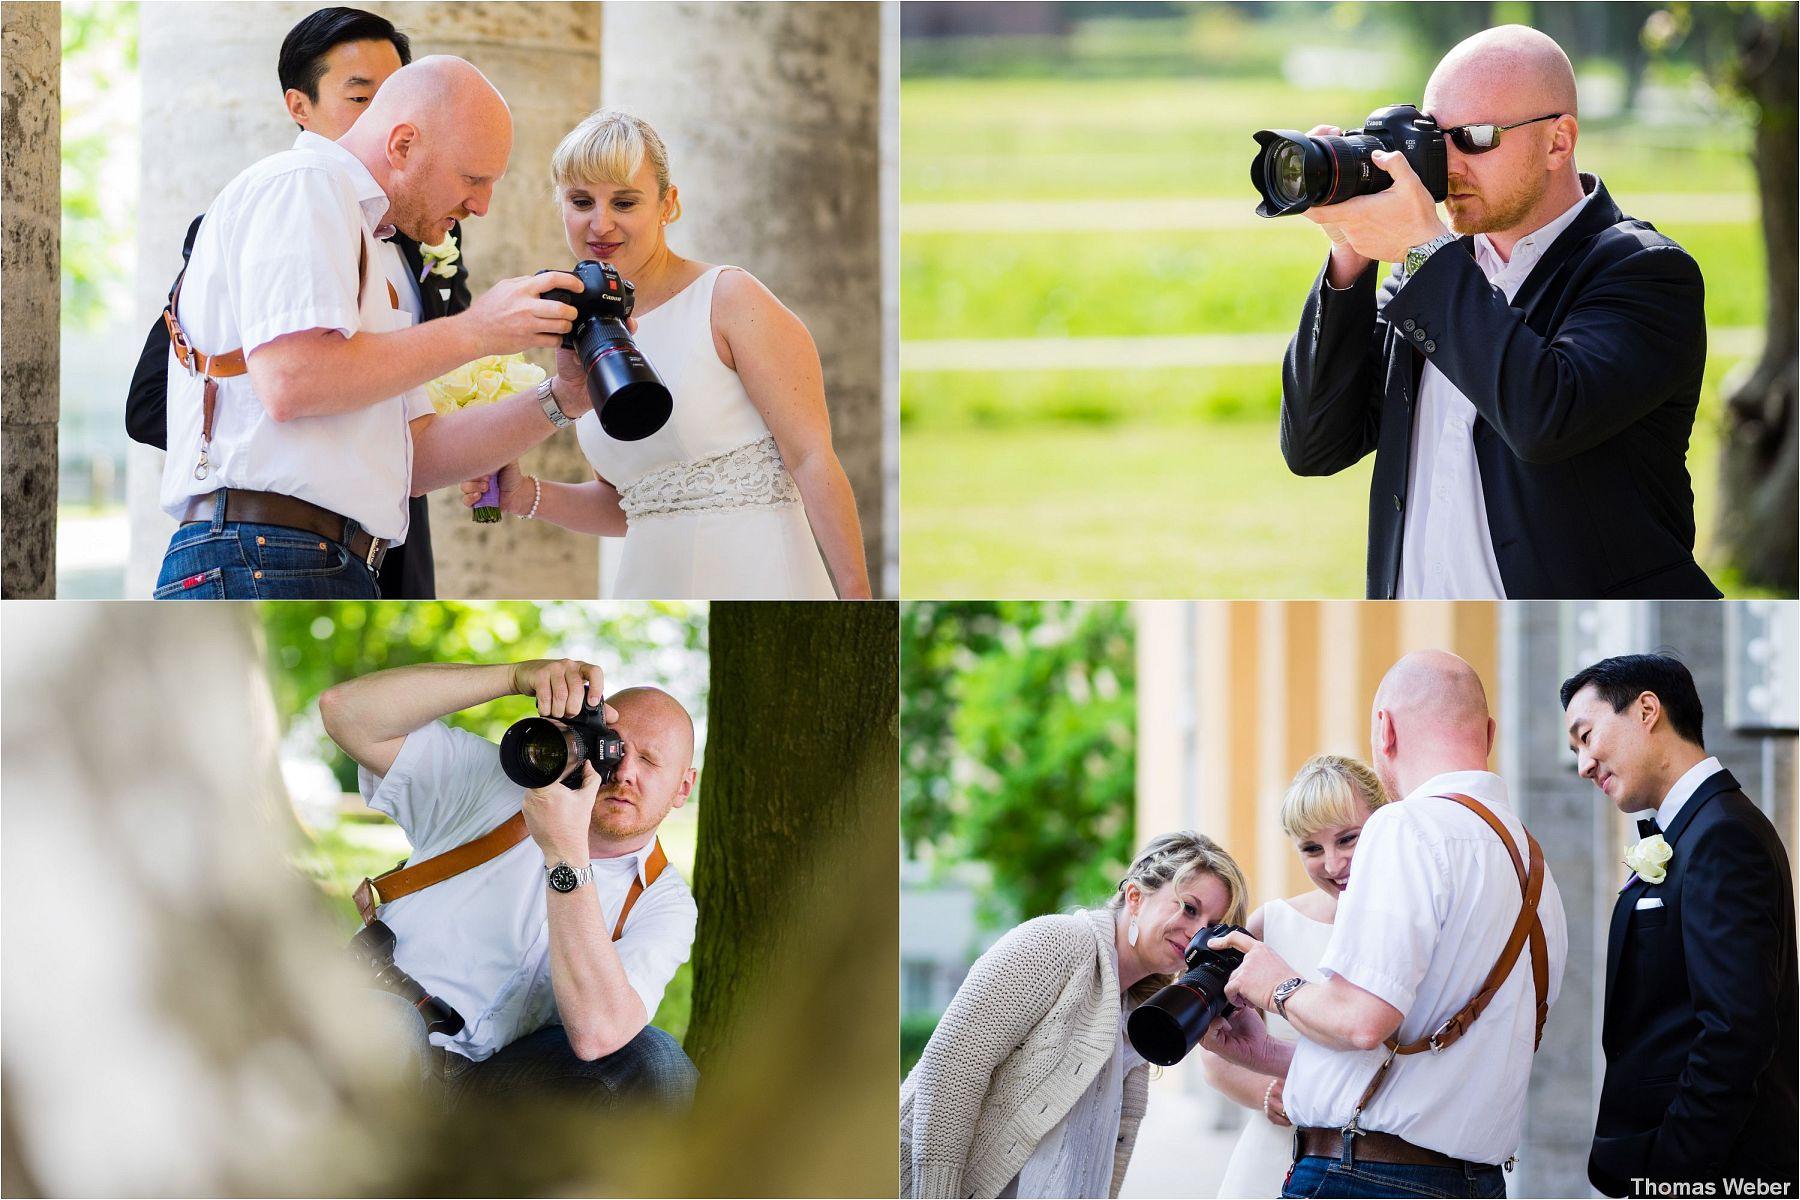 Hochzeitsfotograf Rastede, Thomas Weber